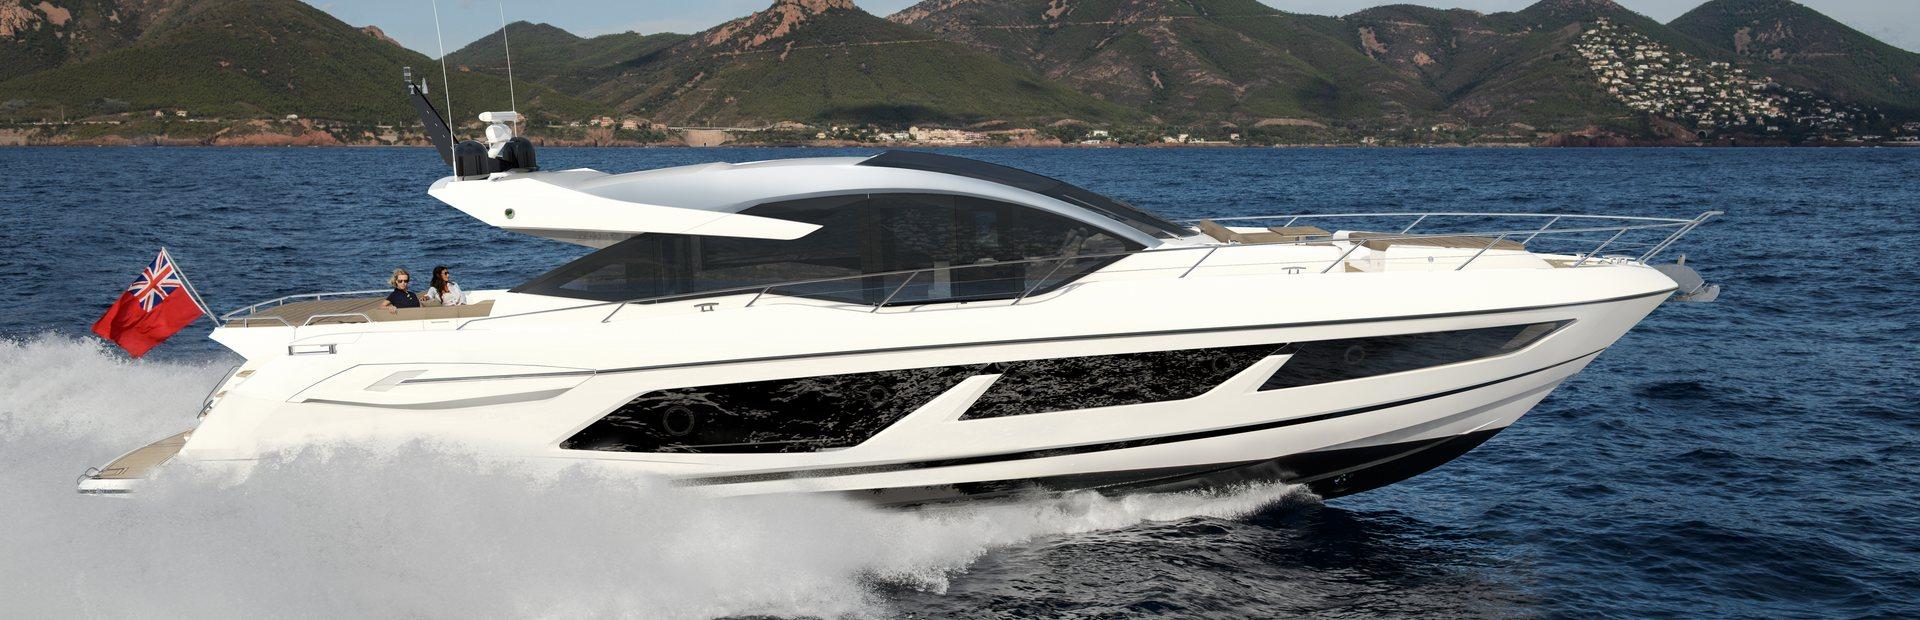 Predator 74 Yacht Charter